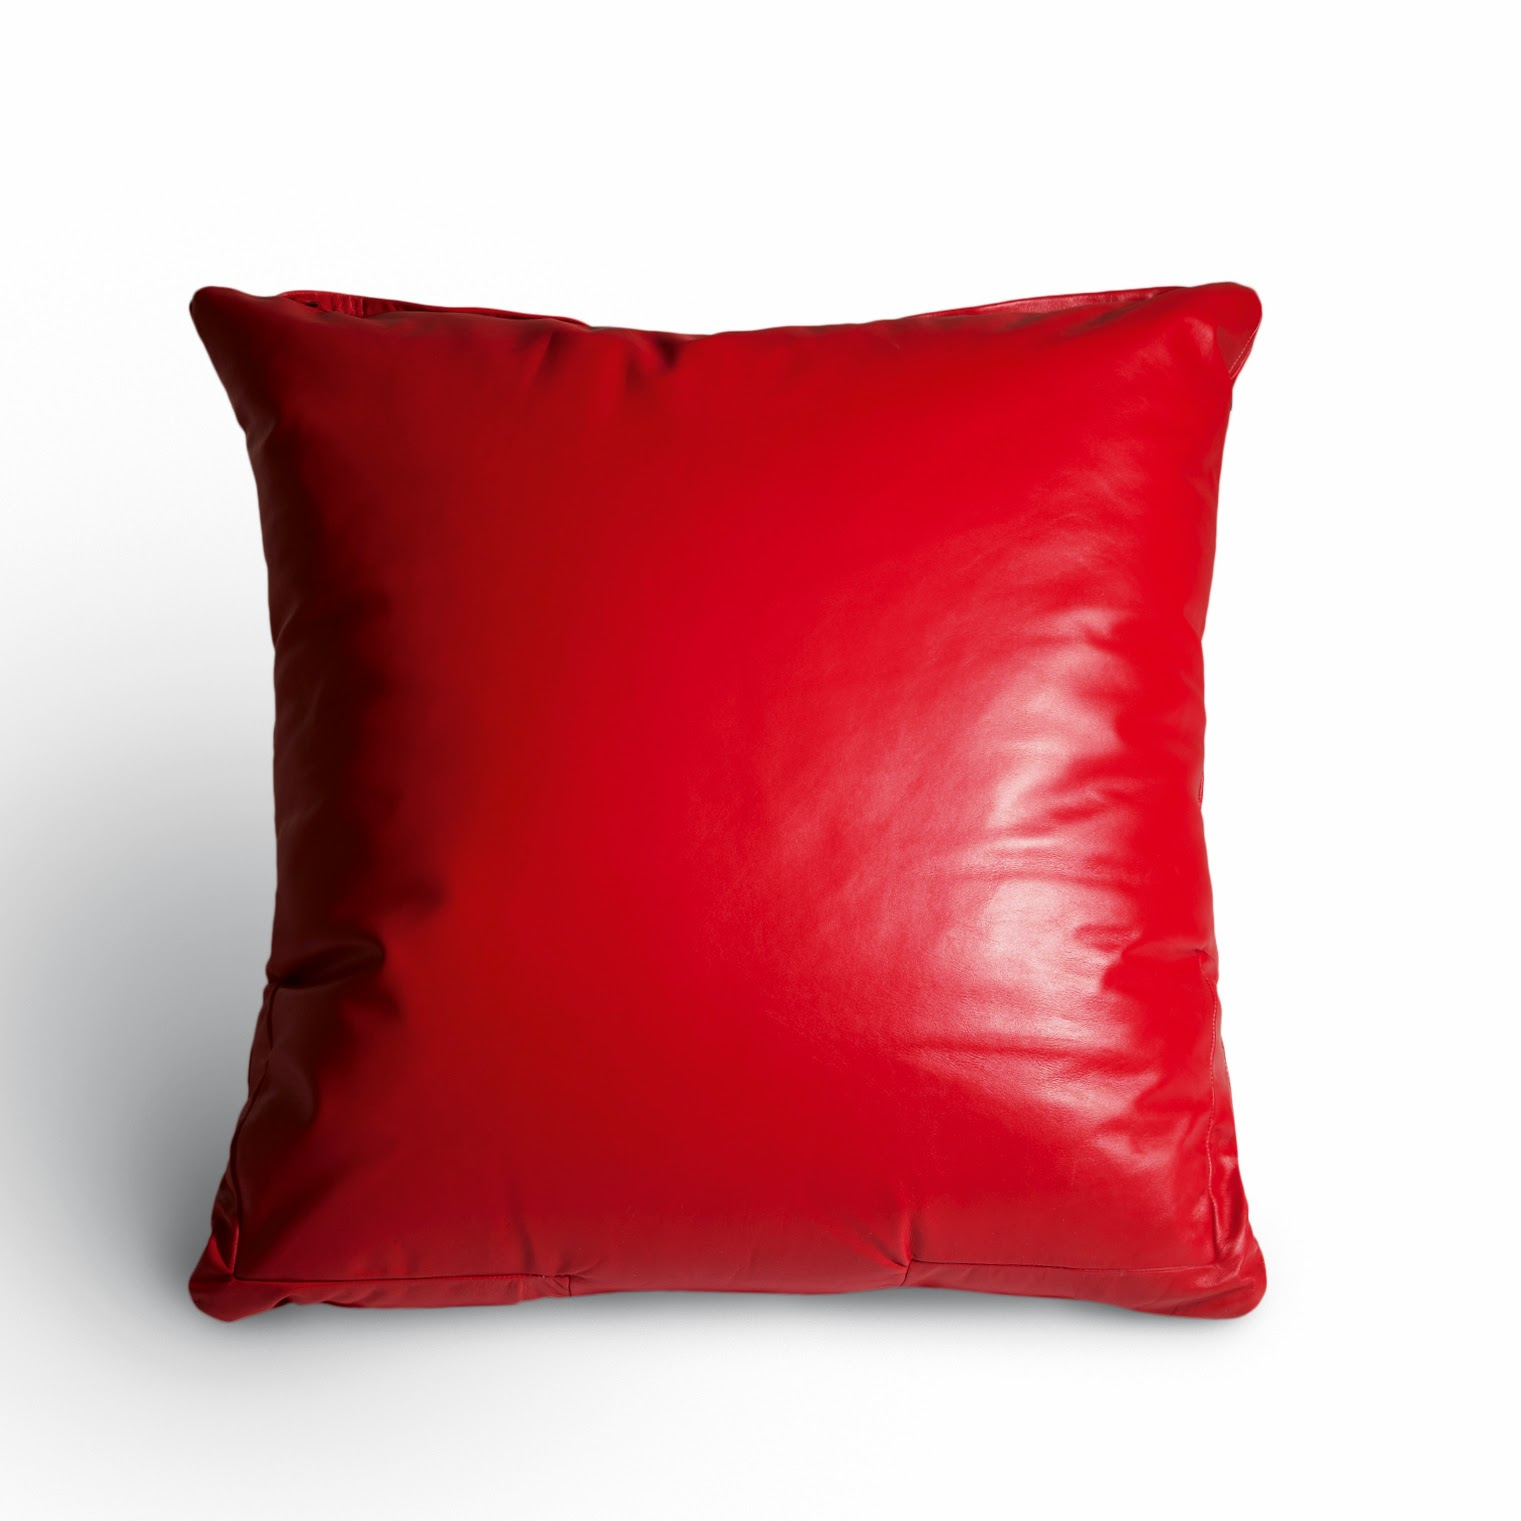 Floor Pillows Leather : Leather Floor Cushion - Le Rouget MilleCouleursBlog